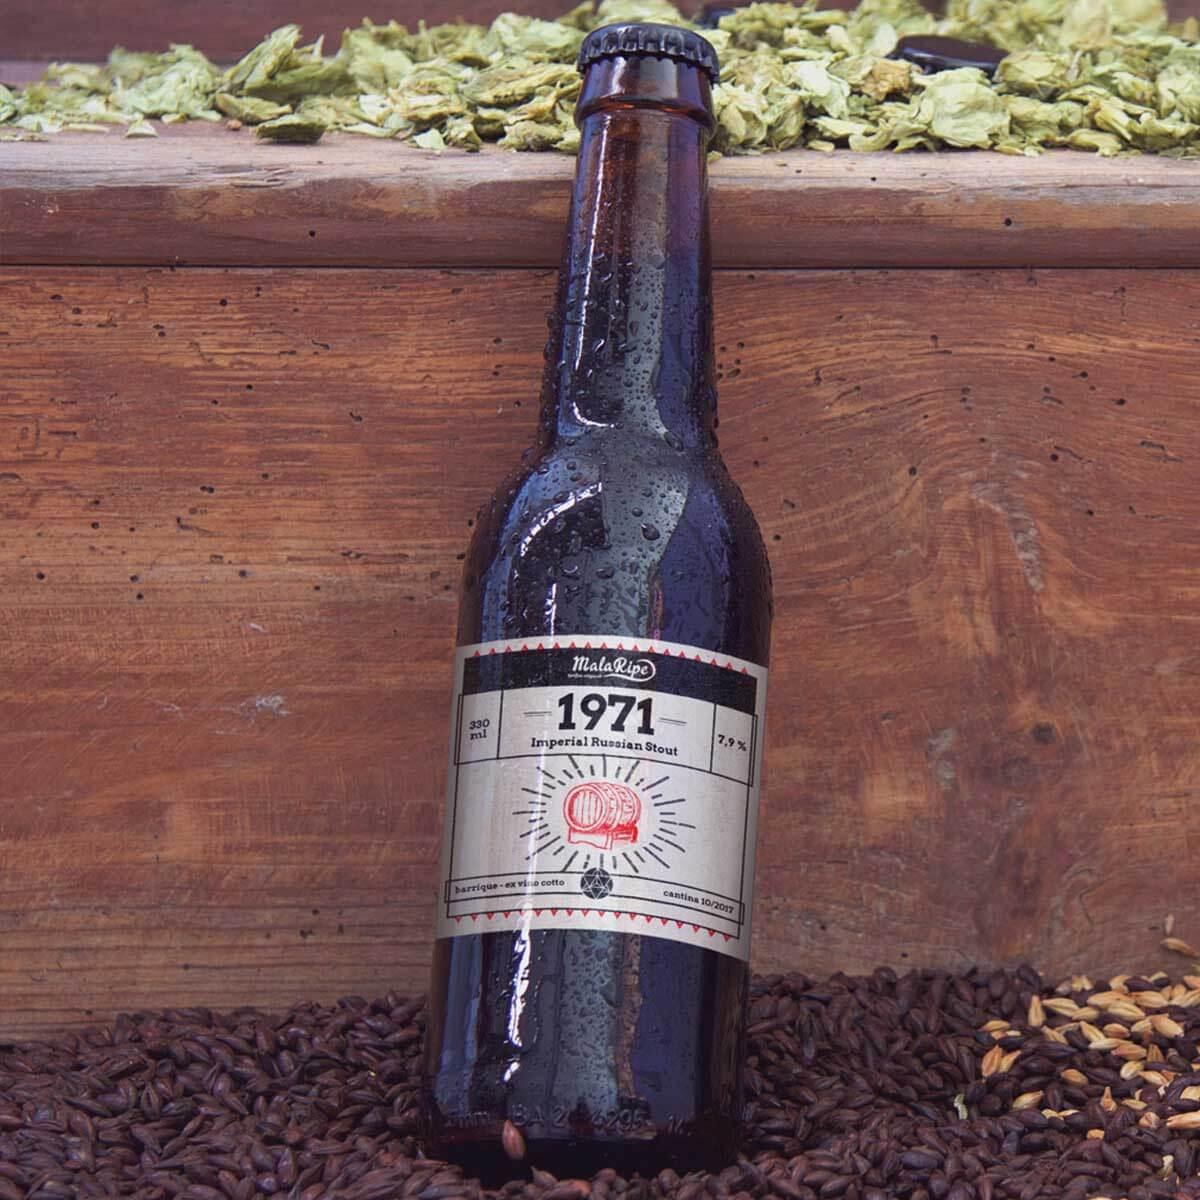 malaripe beer 1971